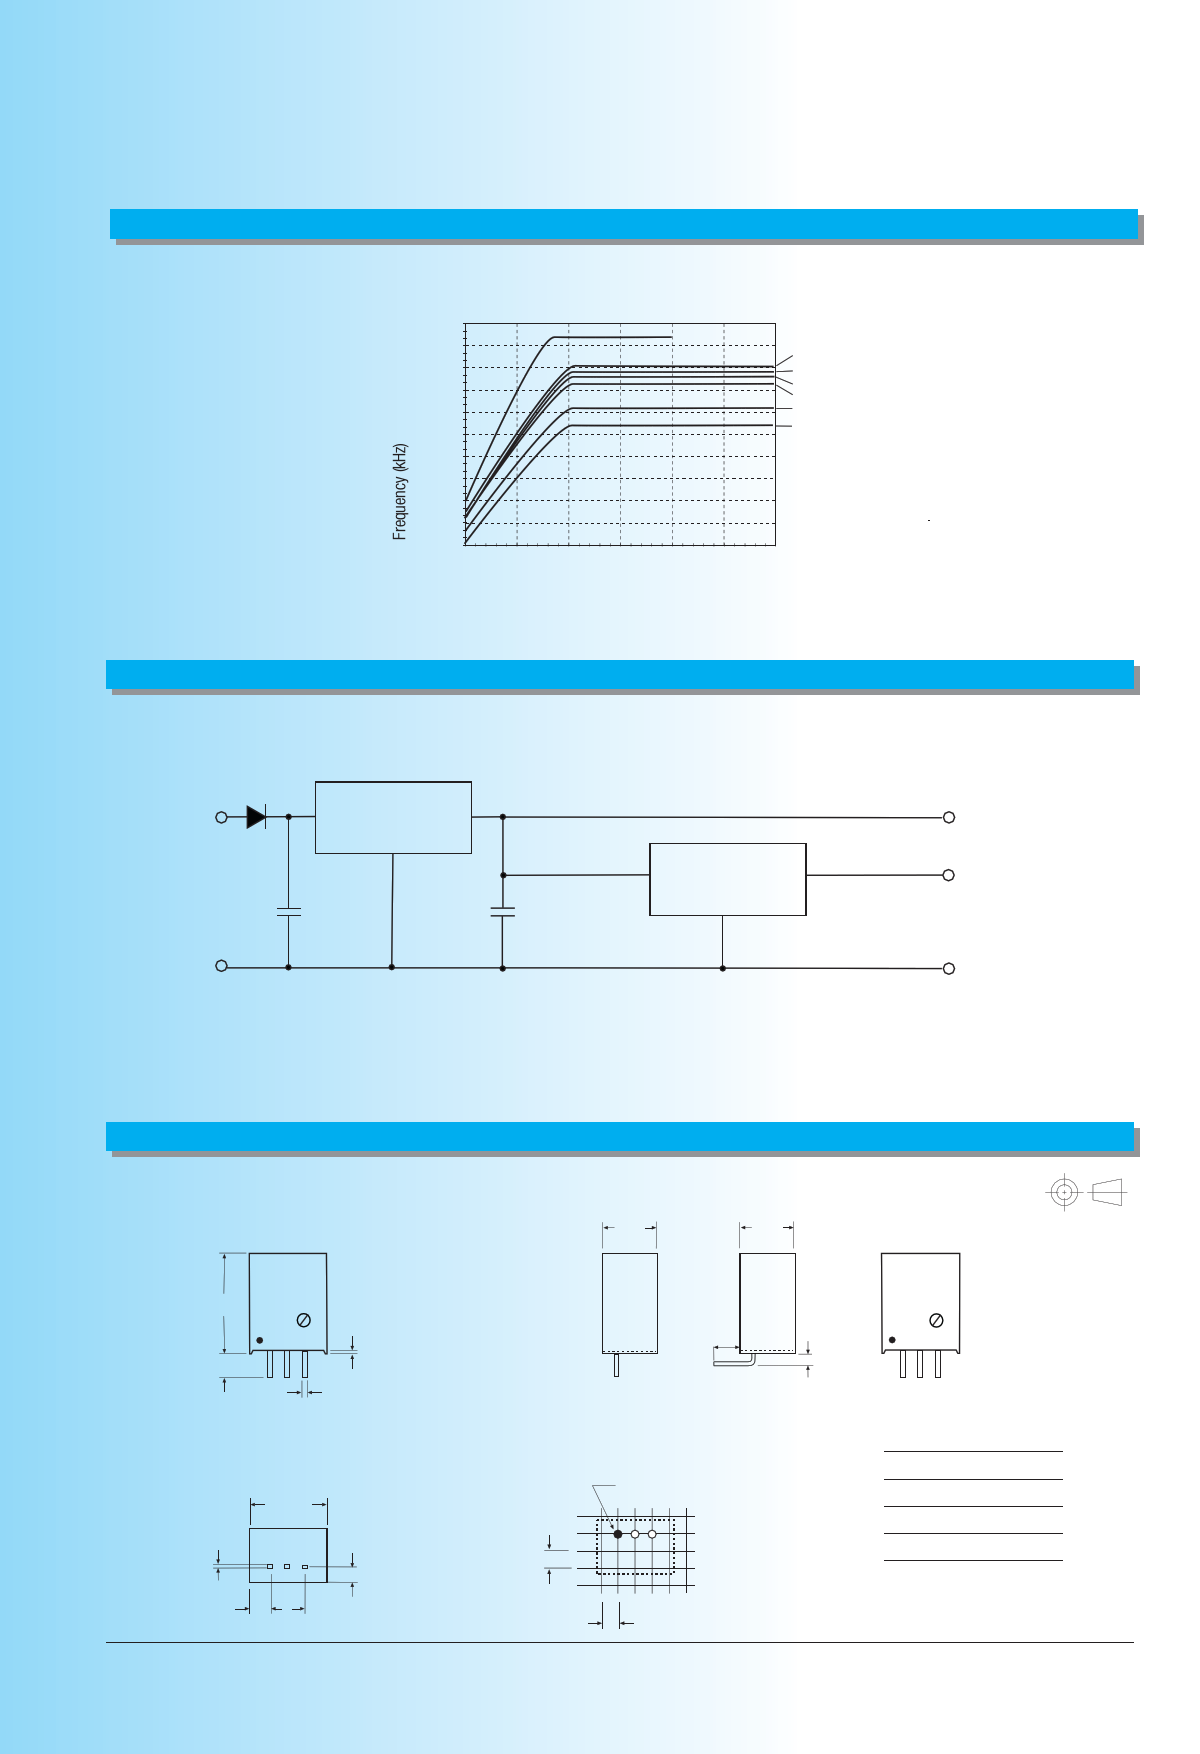 R-78HBxxx-0.5L pdf, 반도체, 판매, 대치품